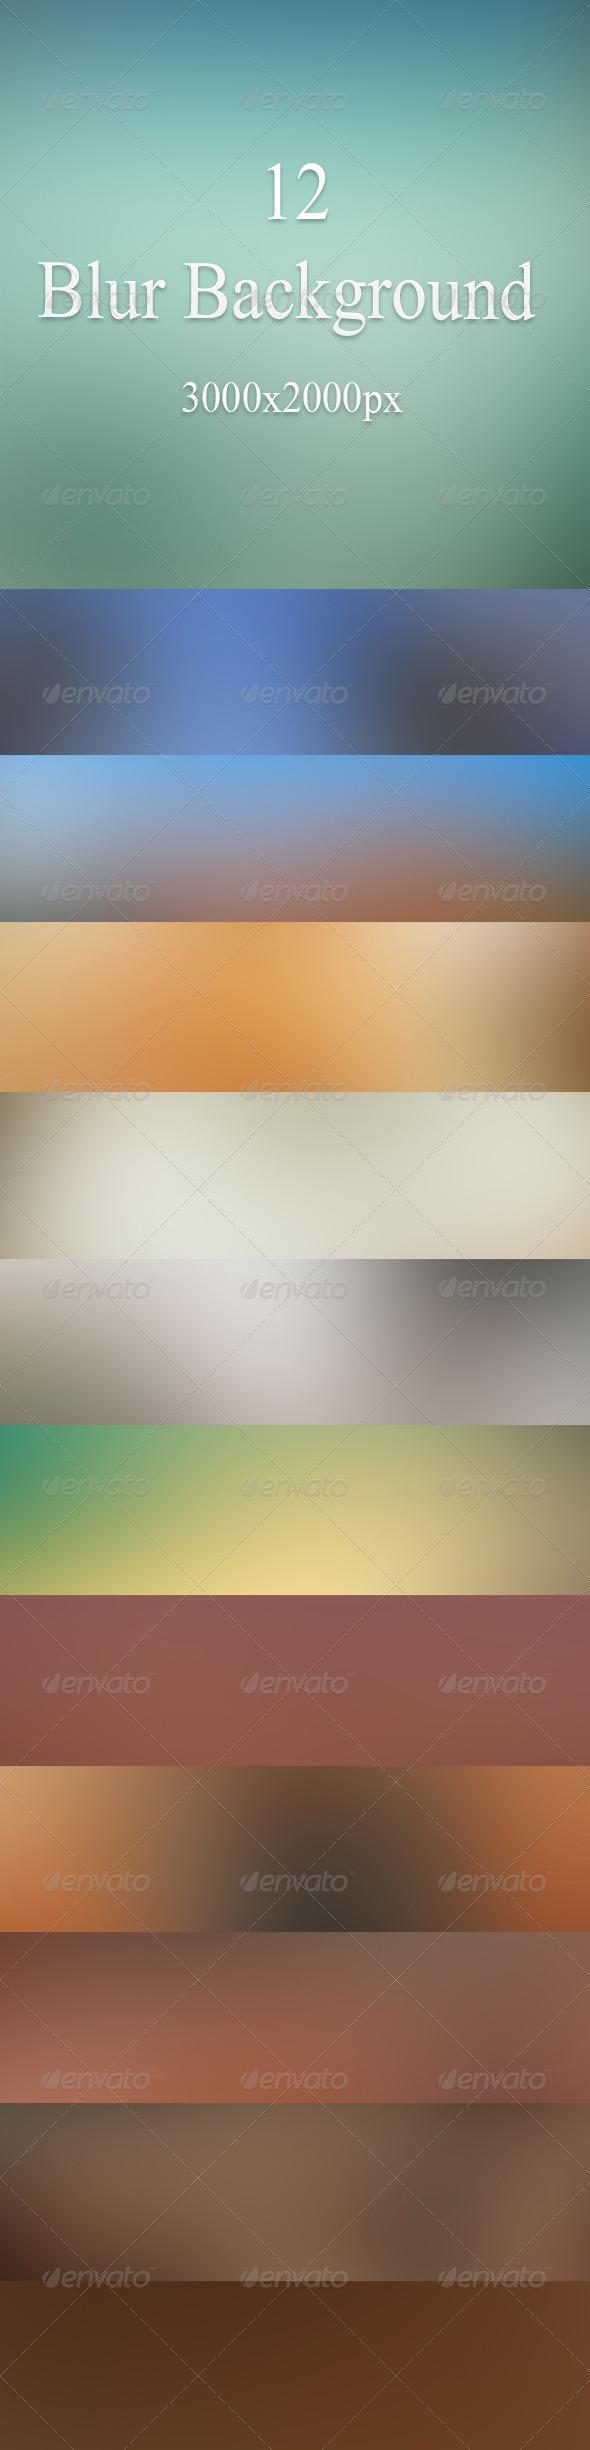 GraphicRiver Blur Background 7676865